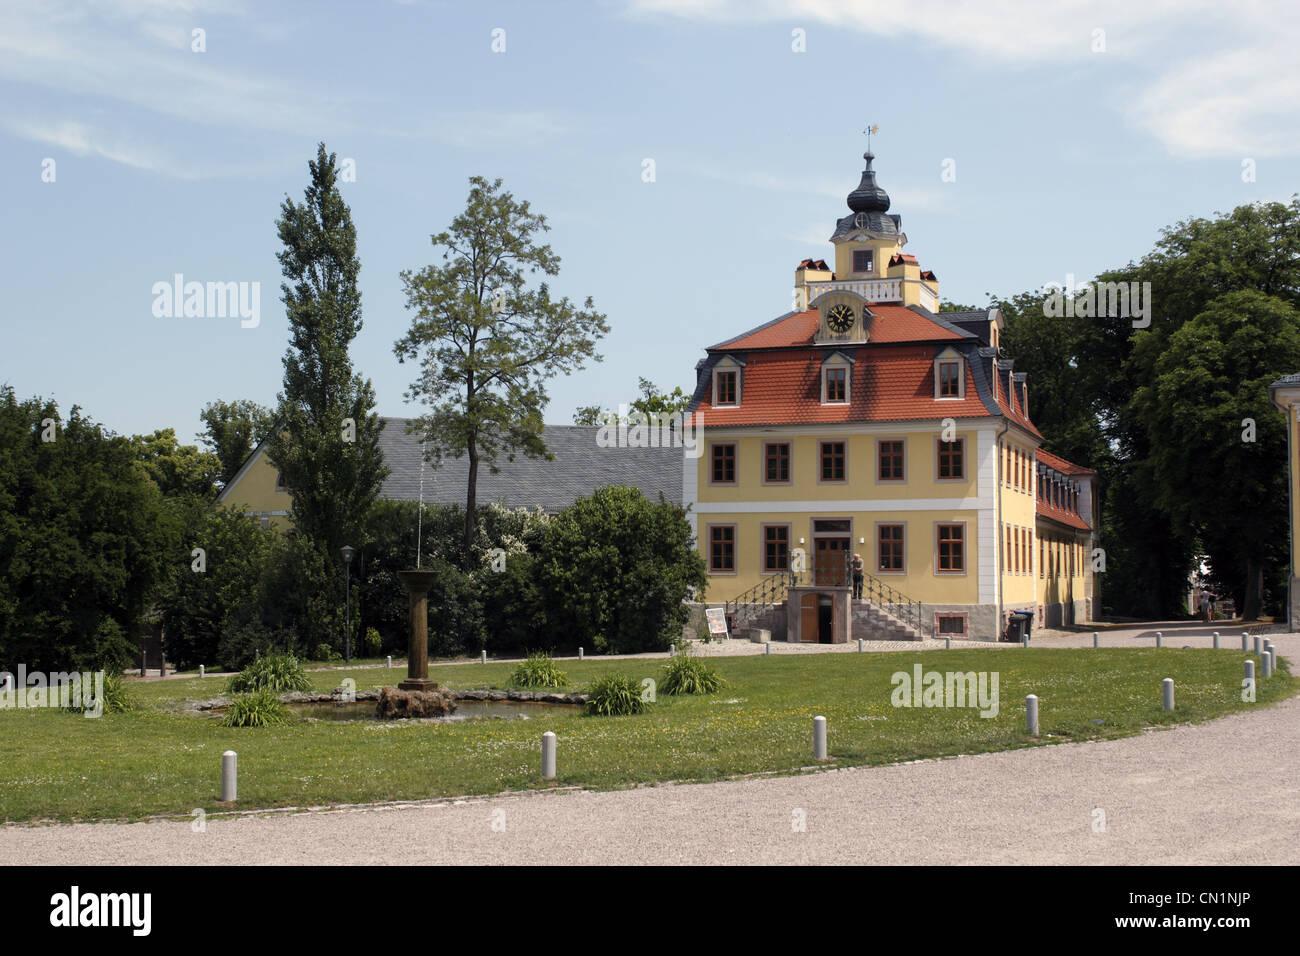 Thuringe Weimar Château Belvedere Banque D'Images